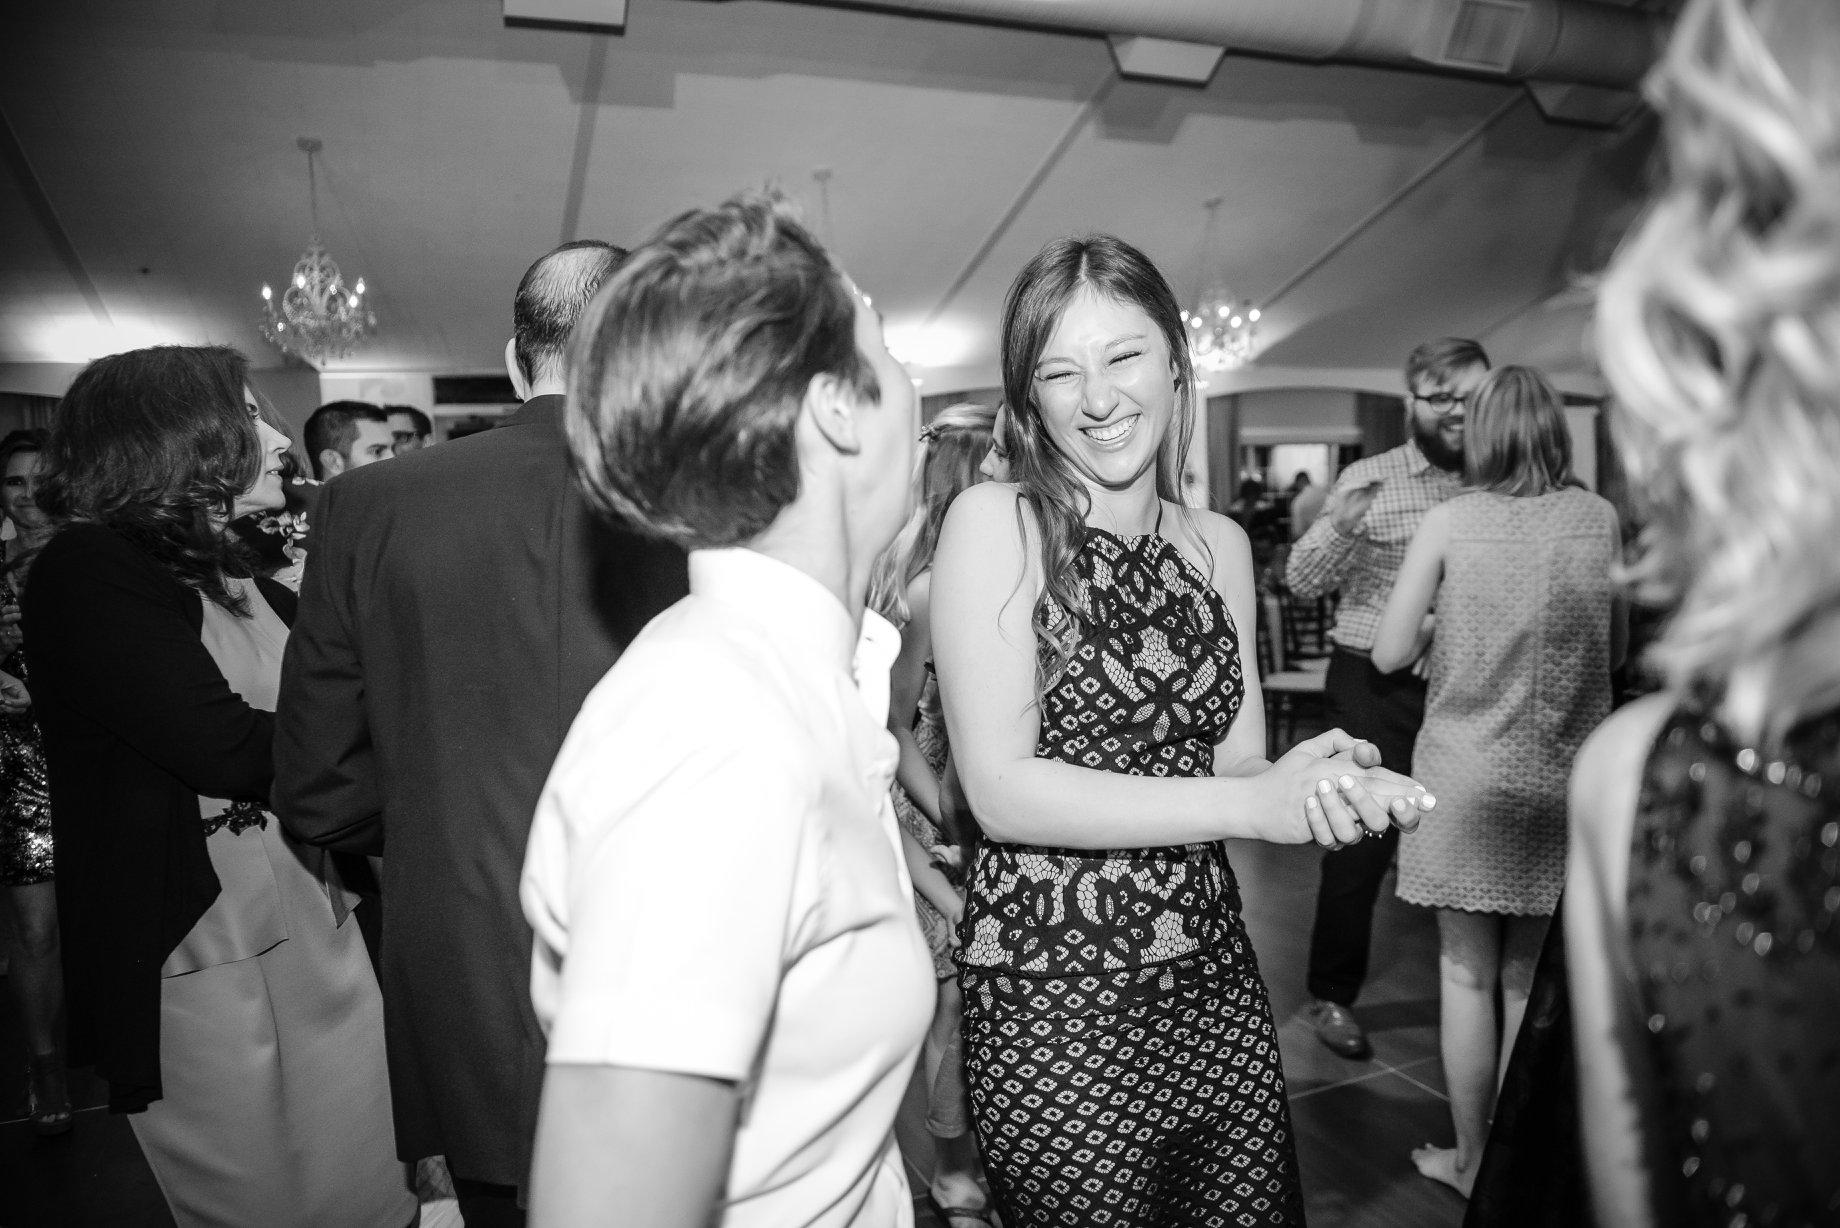 djkanoya_pontewinery-wedding-johnston-dance_bw.jpg